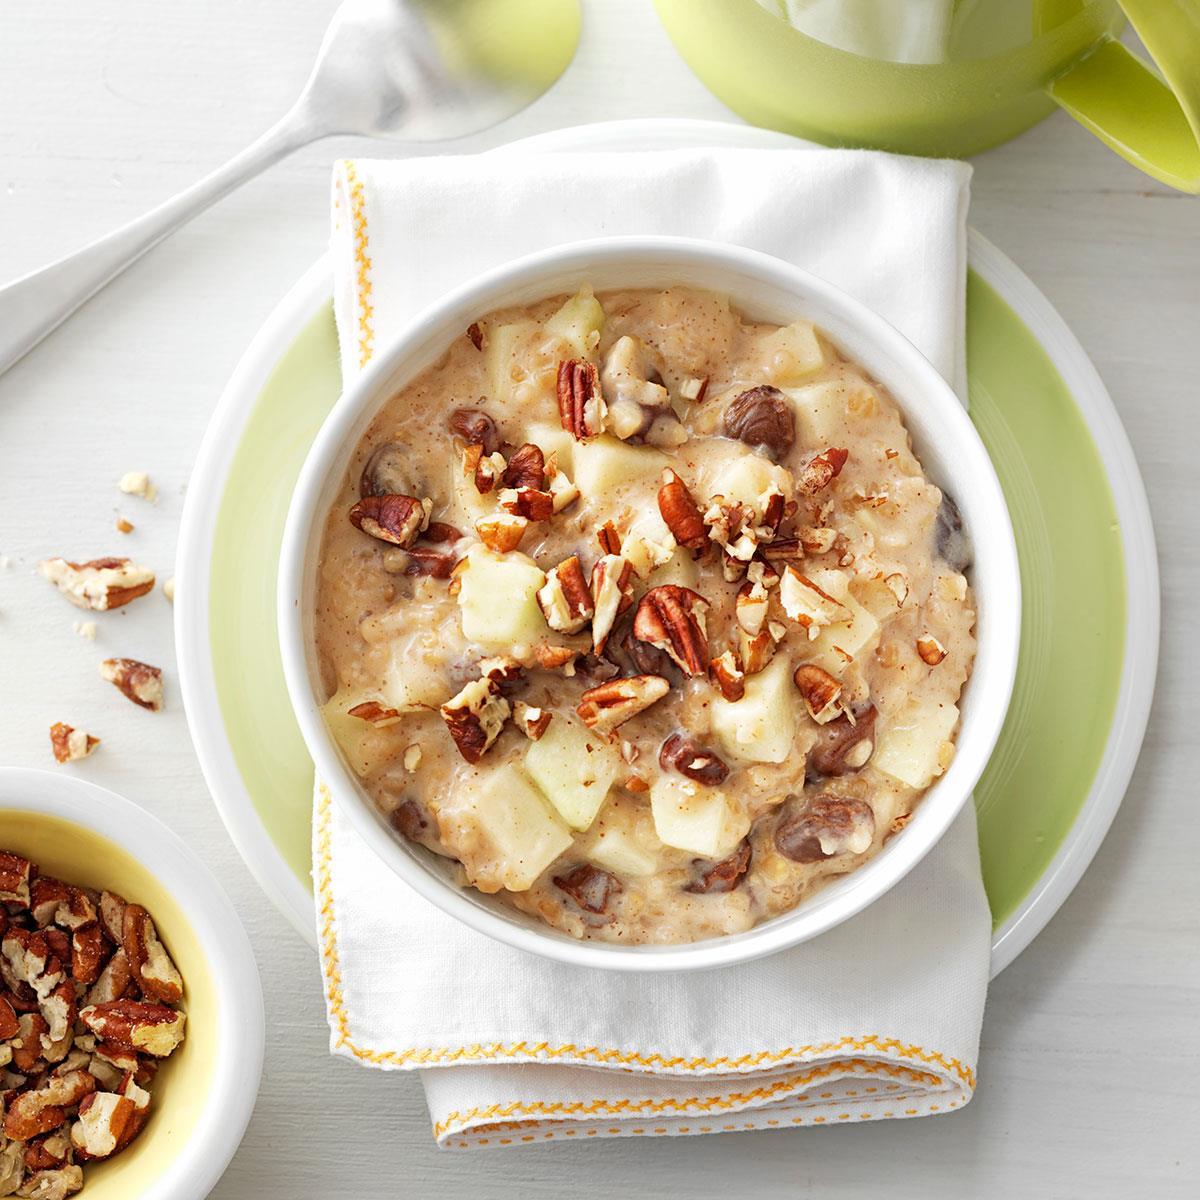 Raisin Nut Oatmeal Recipe | Taste of Home